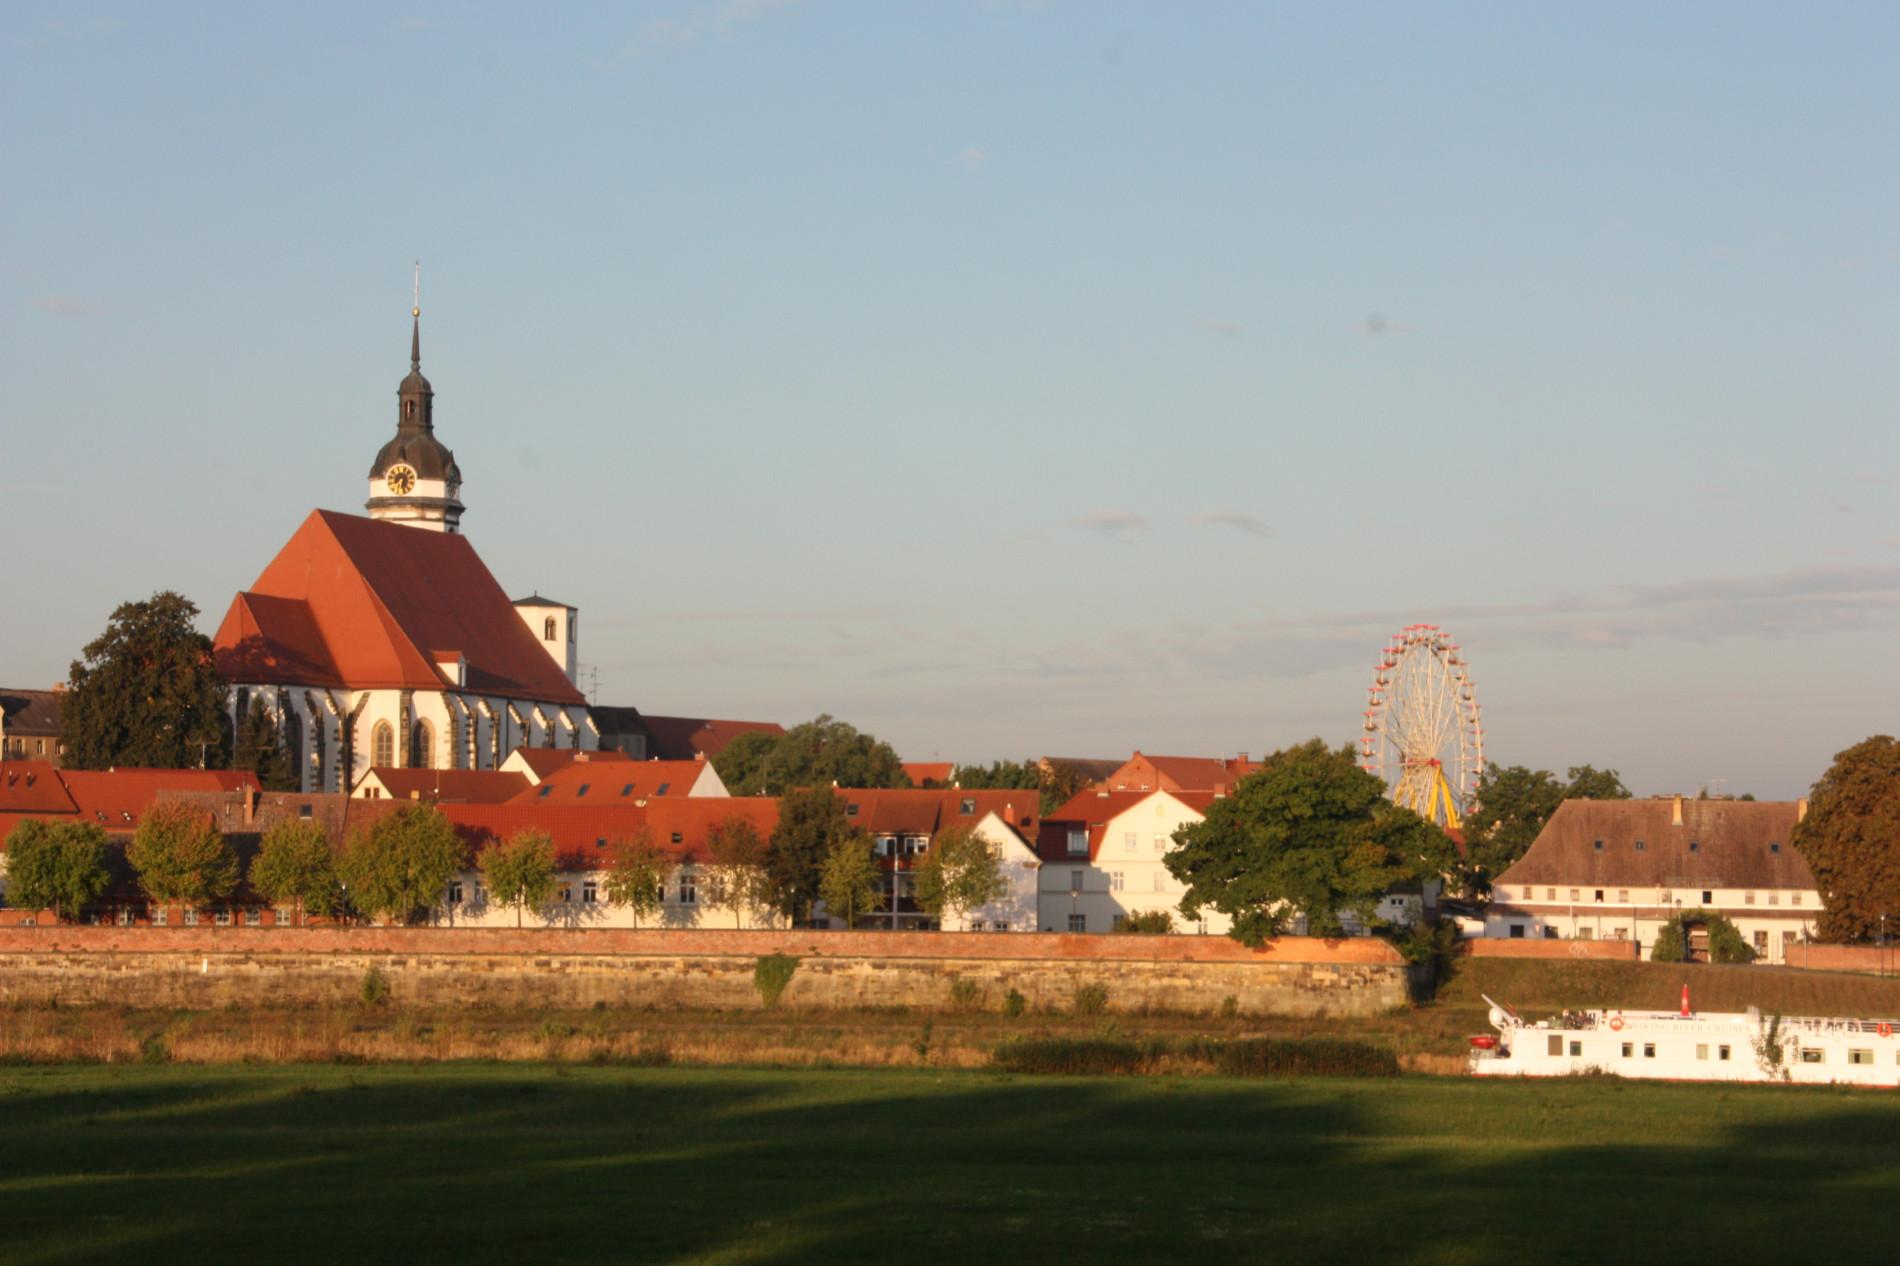 Torgau Stadtkirche